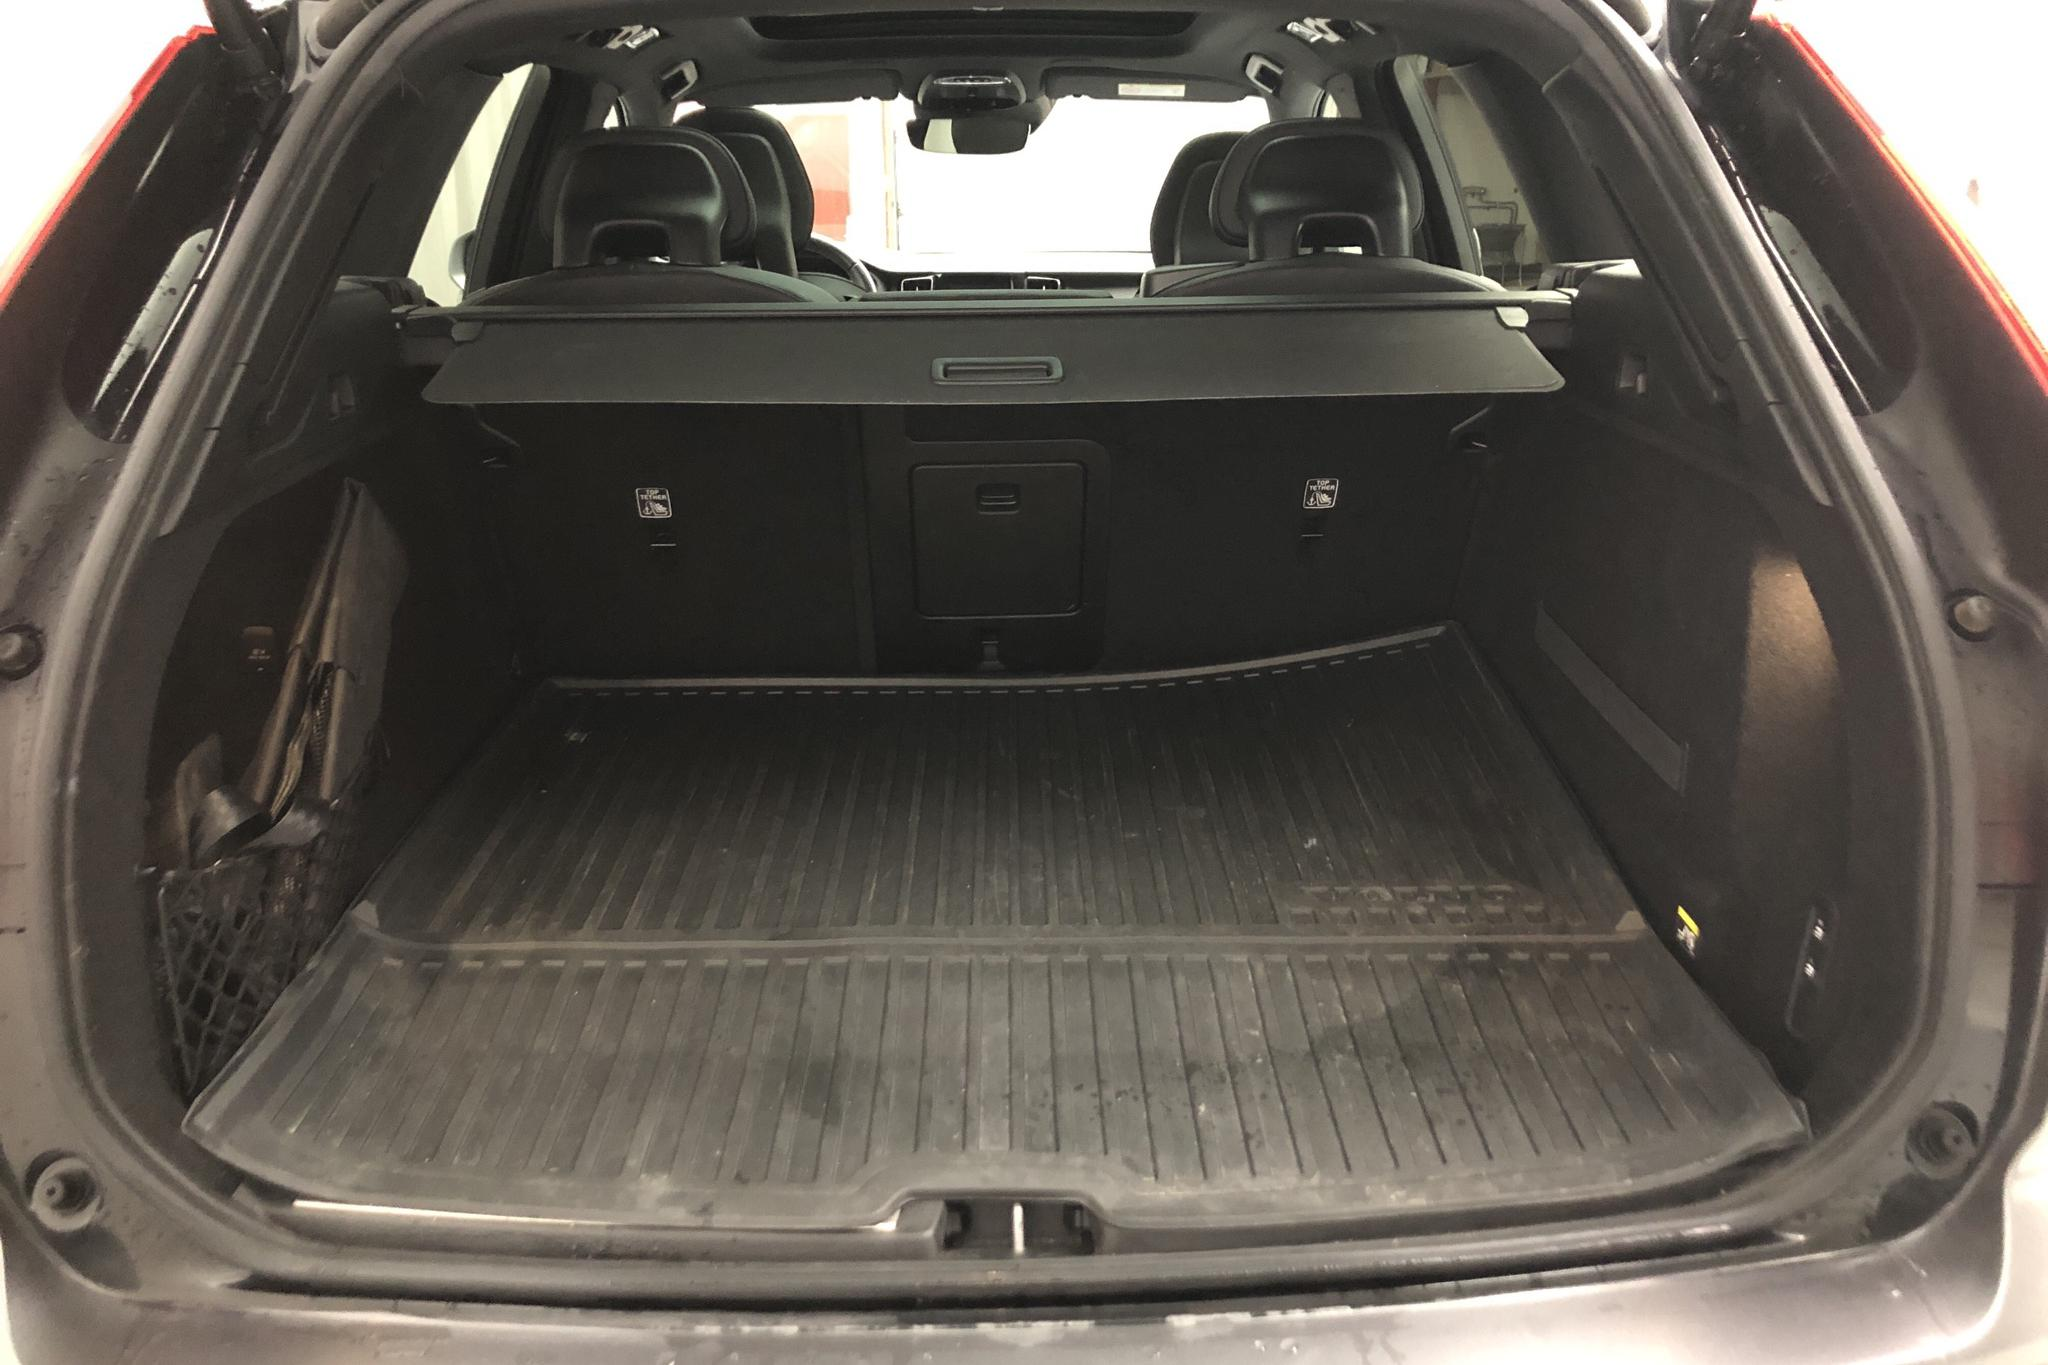 Volvo XC60 T8 AWD Twin Engine (407hk) - 82 910 km - Automatic - black - 2018